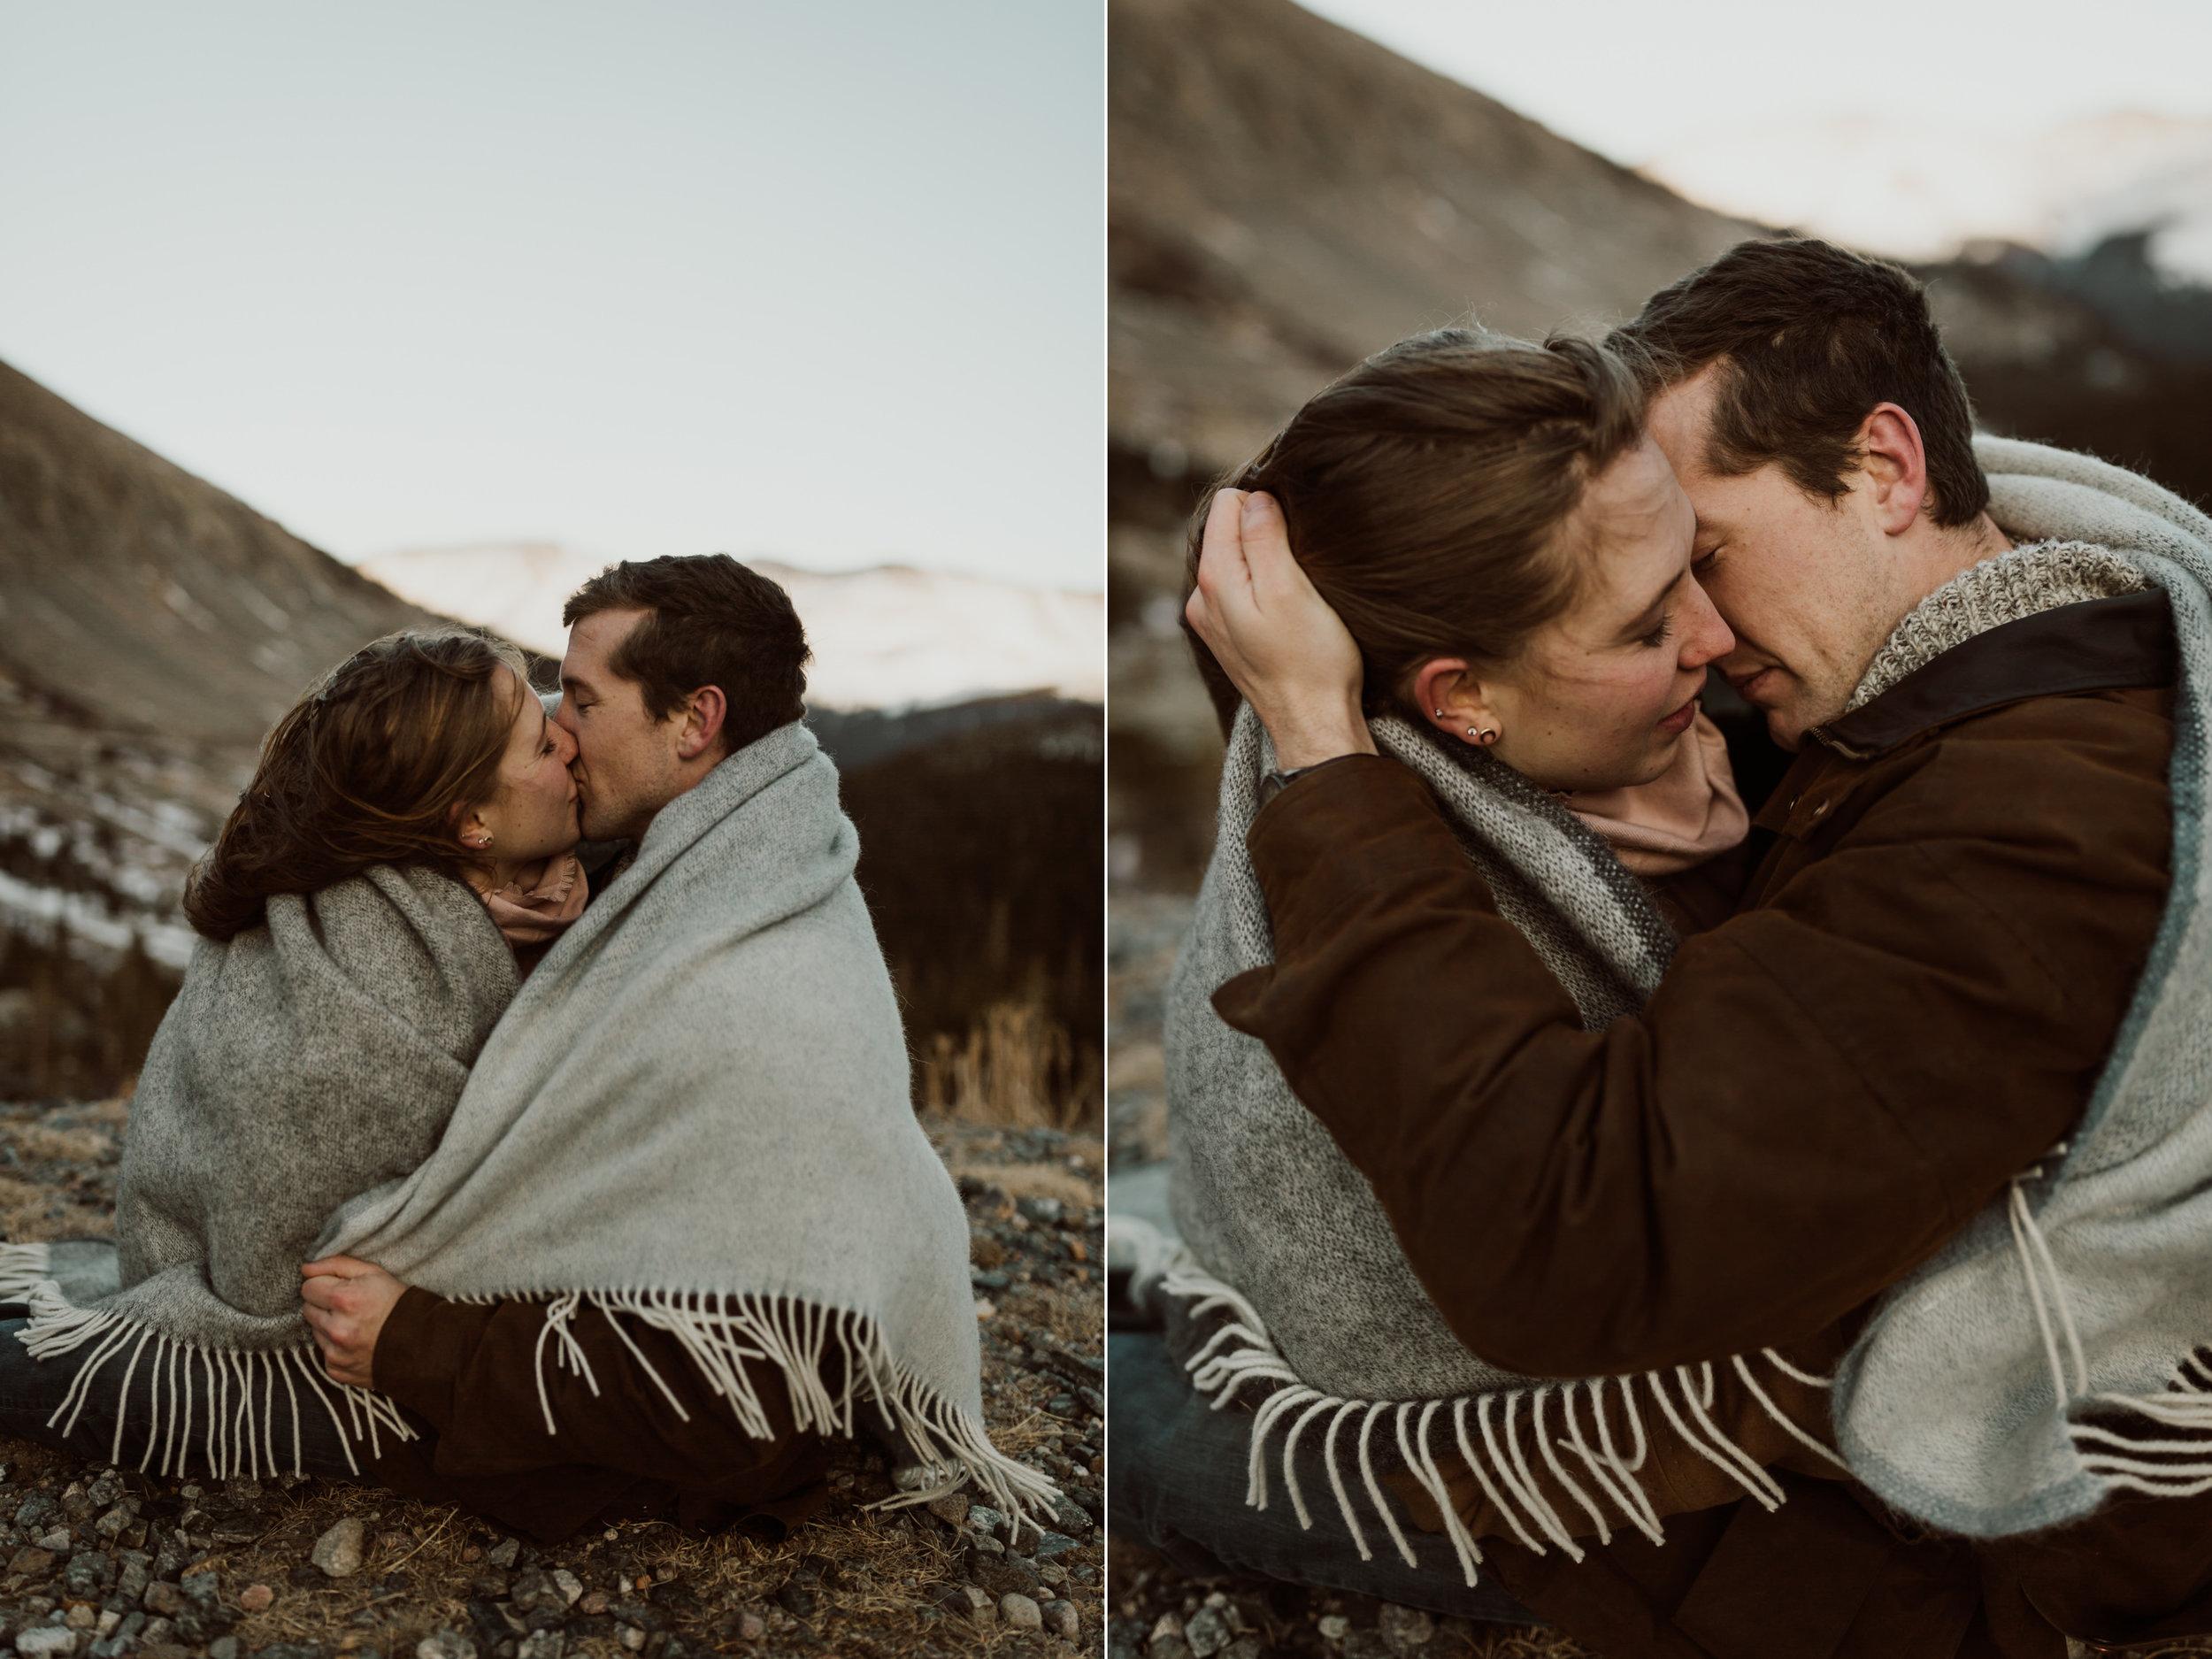 Breckenridge-wedding-photographer-59.jpg